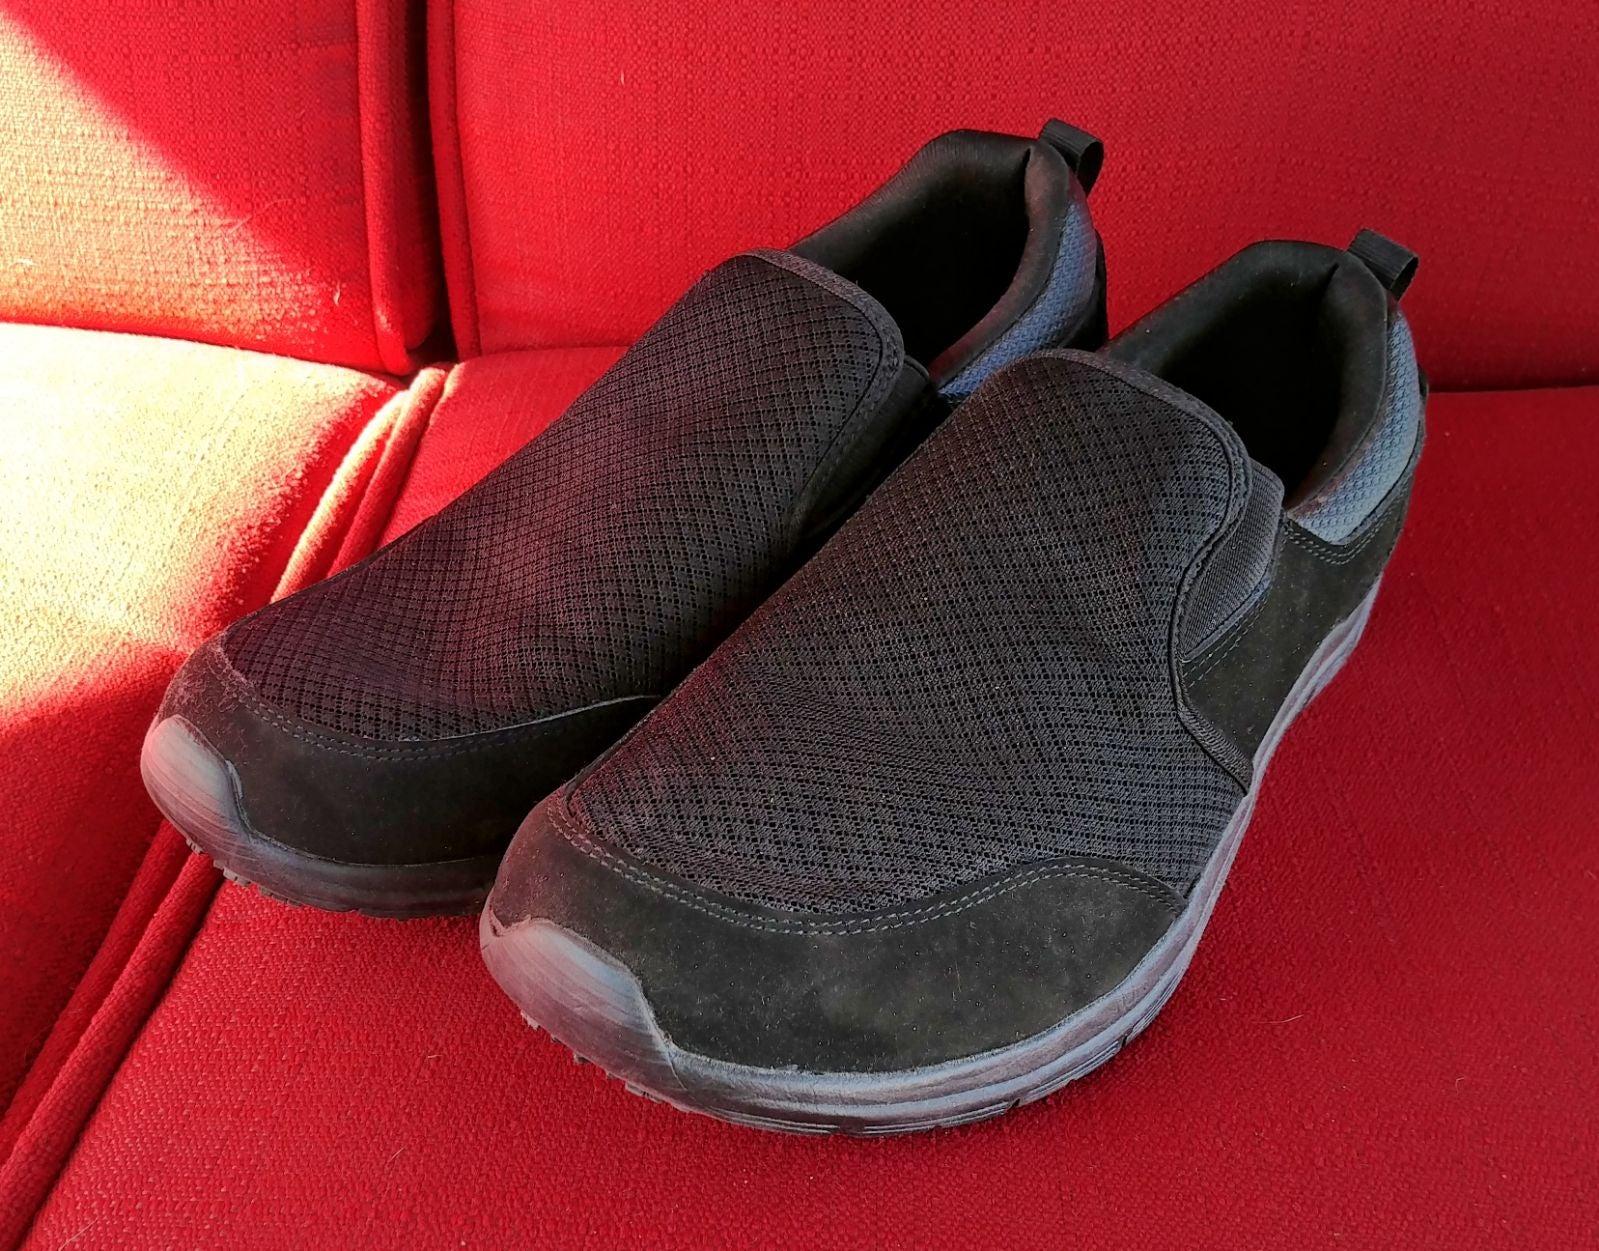 Payless Work \u0026 Safety Shoes | Mercari